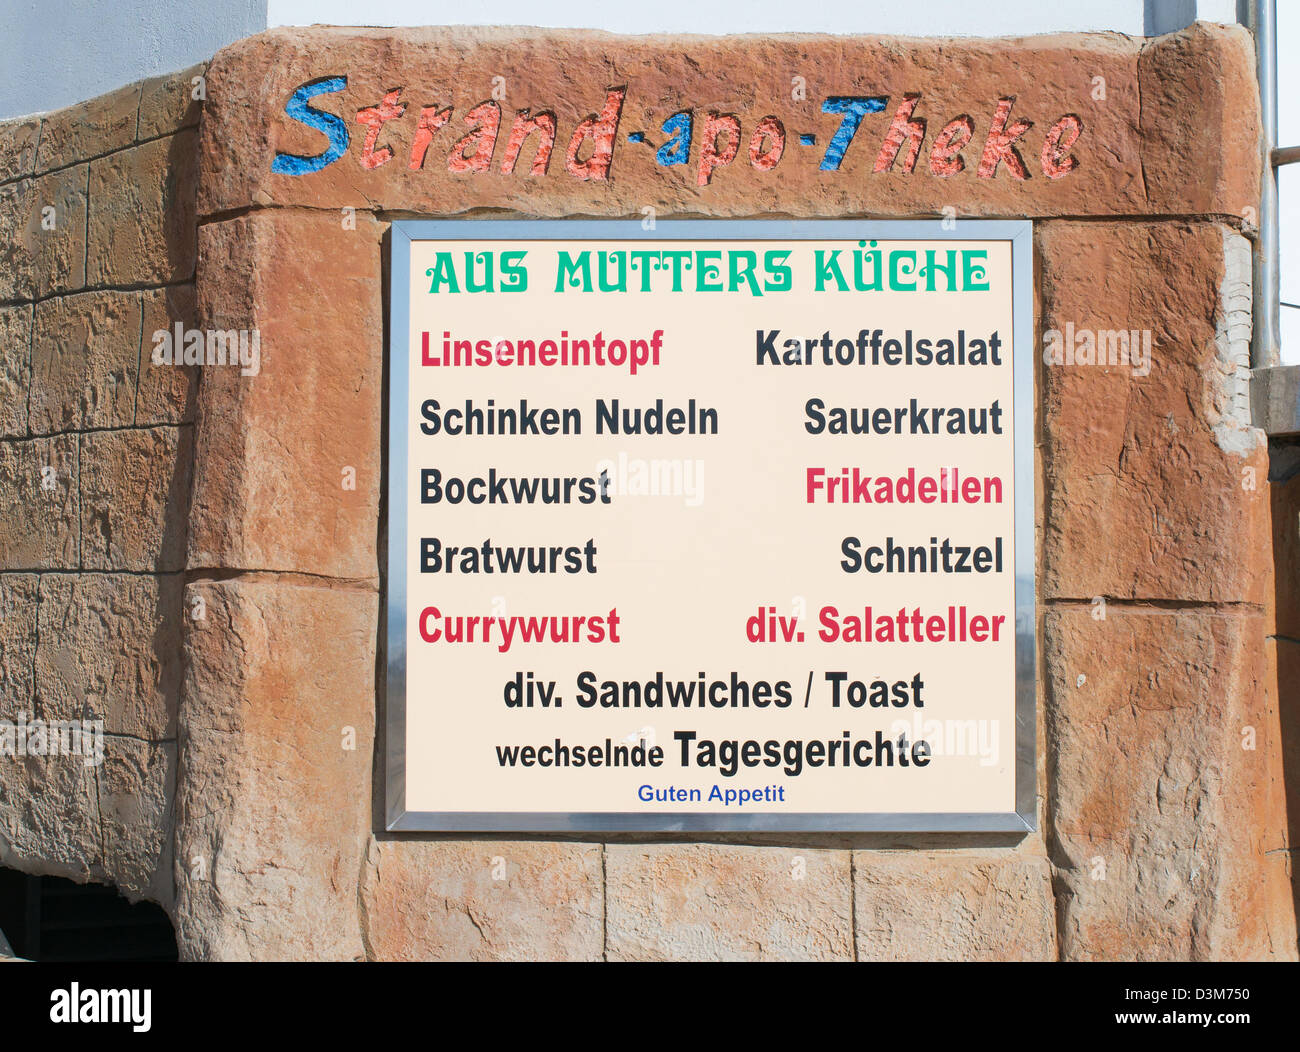 German run café Aus Mutters Kuche in Meloneras, Maspalomas, Gran Canaria - Stock Image